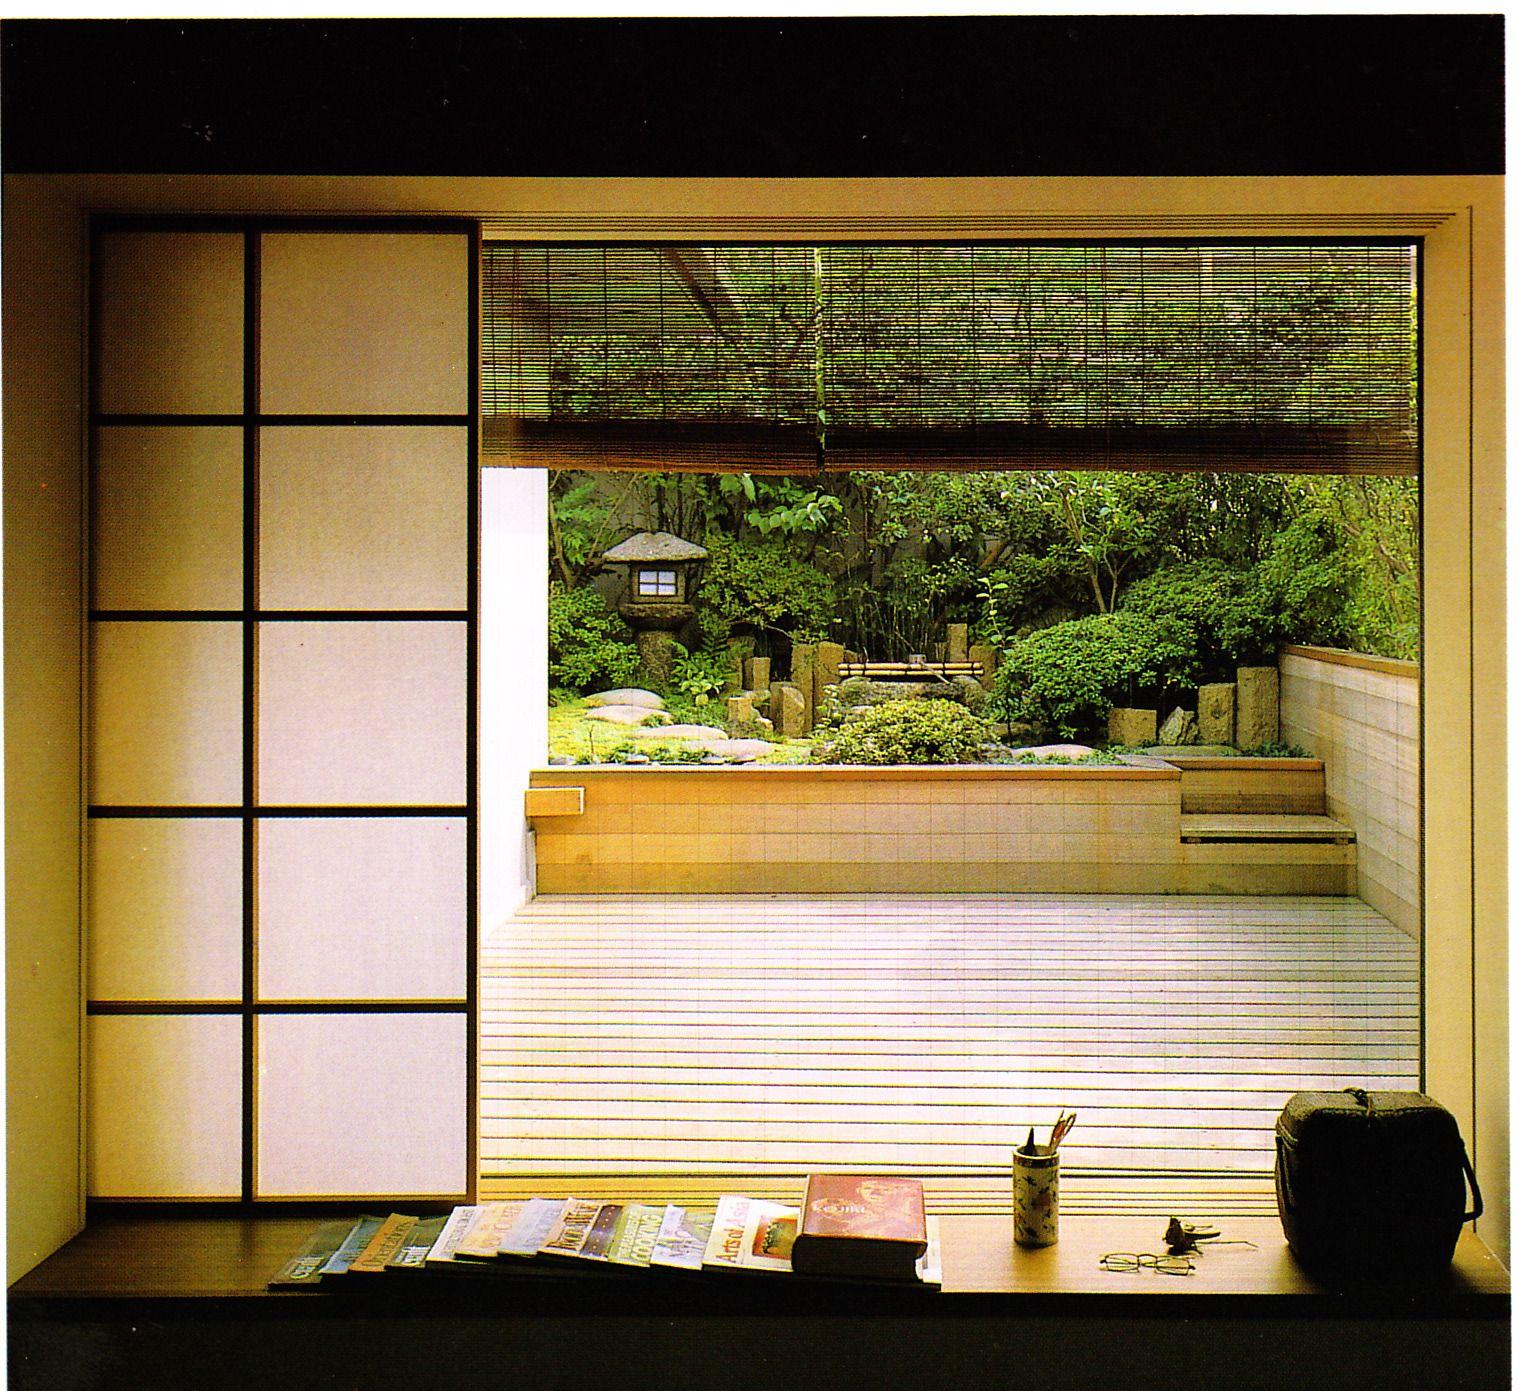 Shoji Screen Outdoor Winter Material Hot Tub   Google Search | HOUSE!!! |  Pinterest | Shoji Screen, Hot Tubs And Tubs